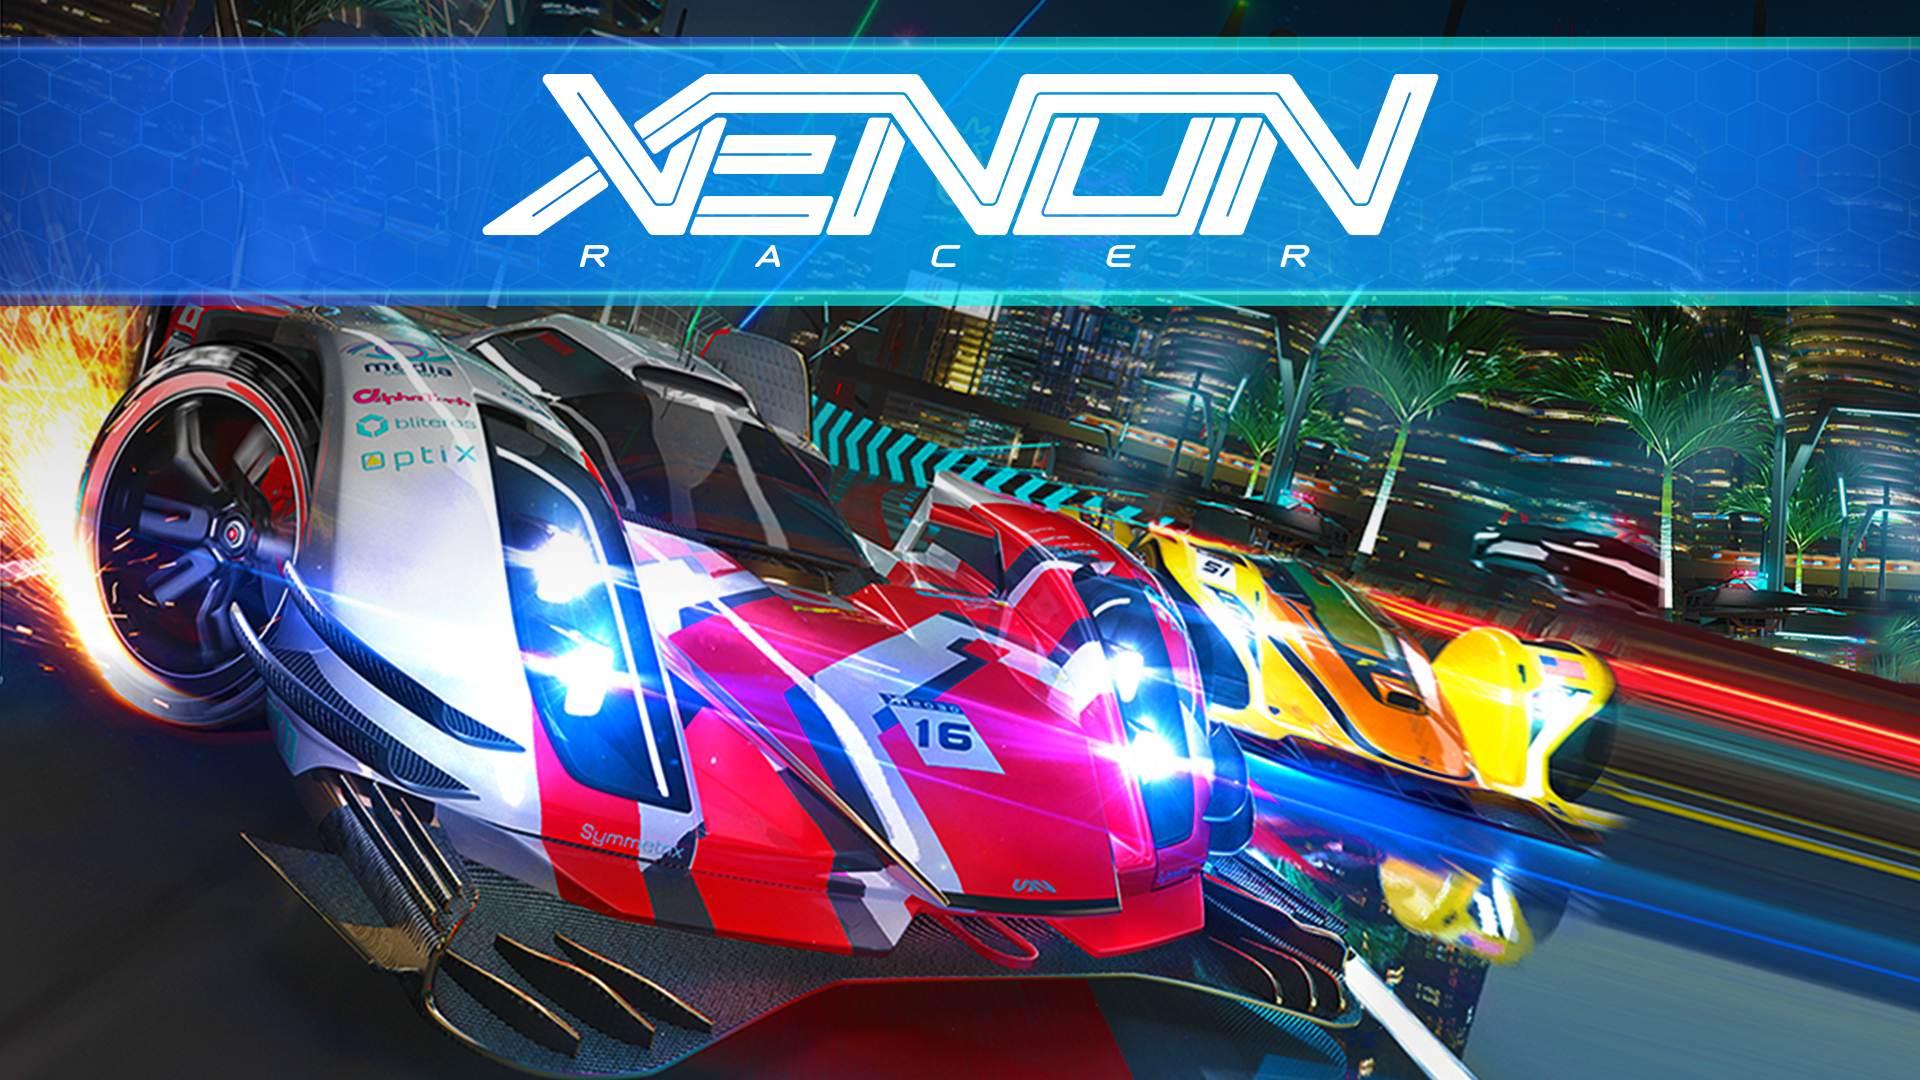 Xenon Racer – Bild 3